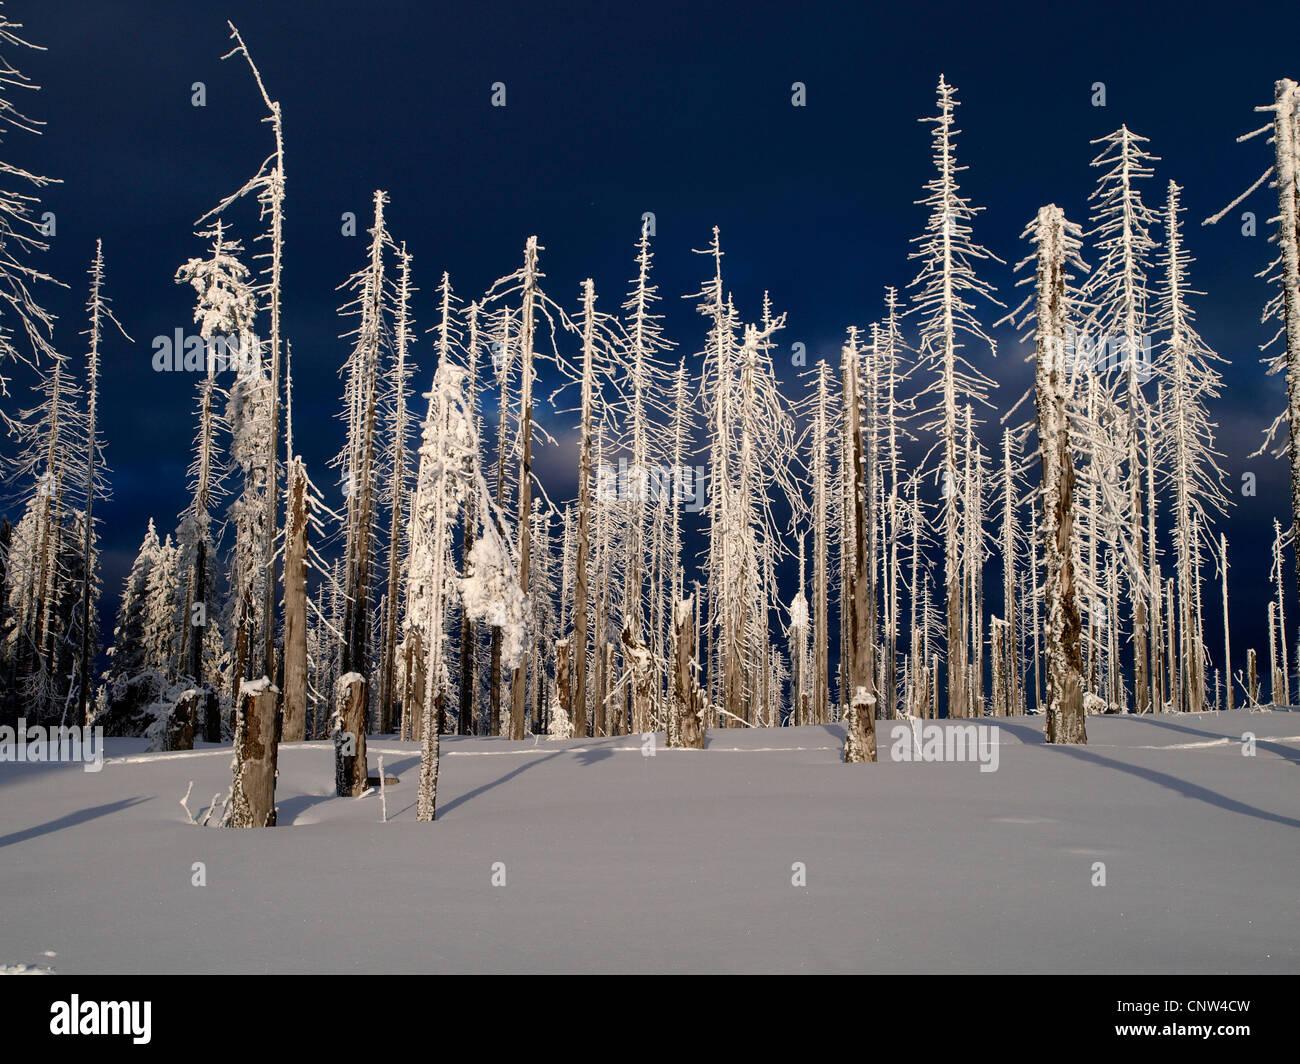 Norway spruce (Picea abies), died spruces, damage by bark beetles, Germany, Bavaria, Bayerischer Wald  , Dreisesselberg - Stock Image